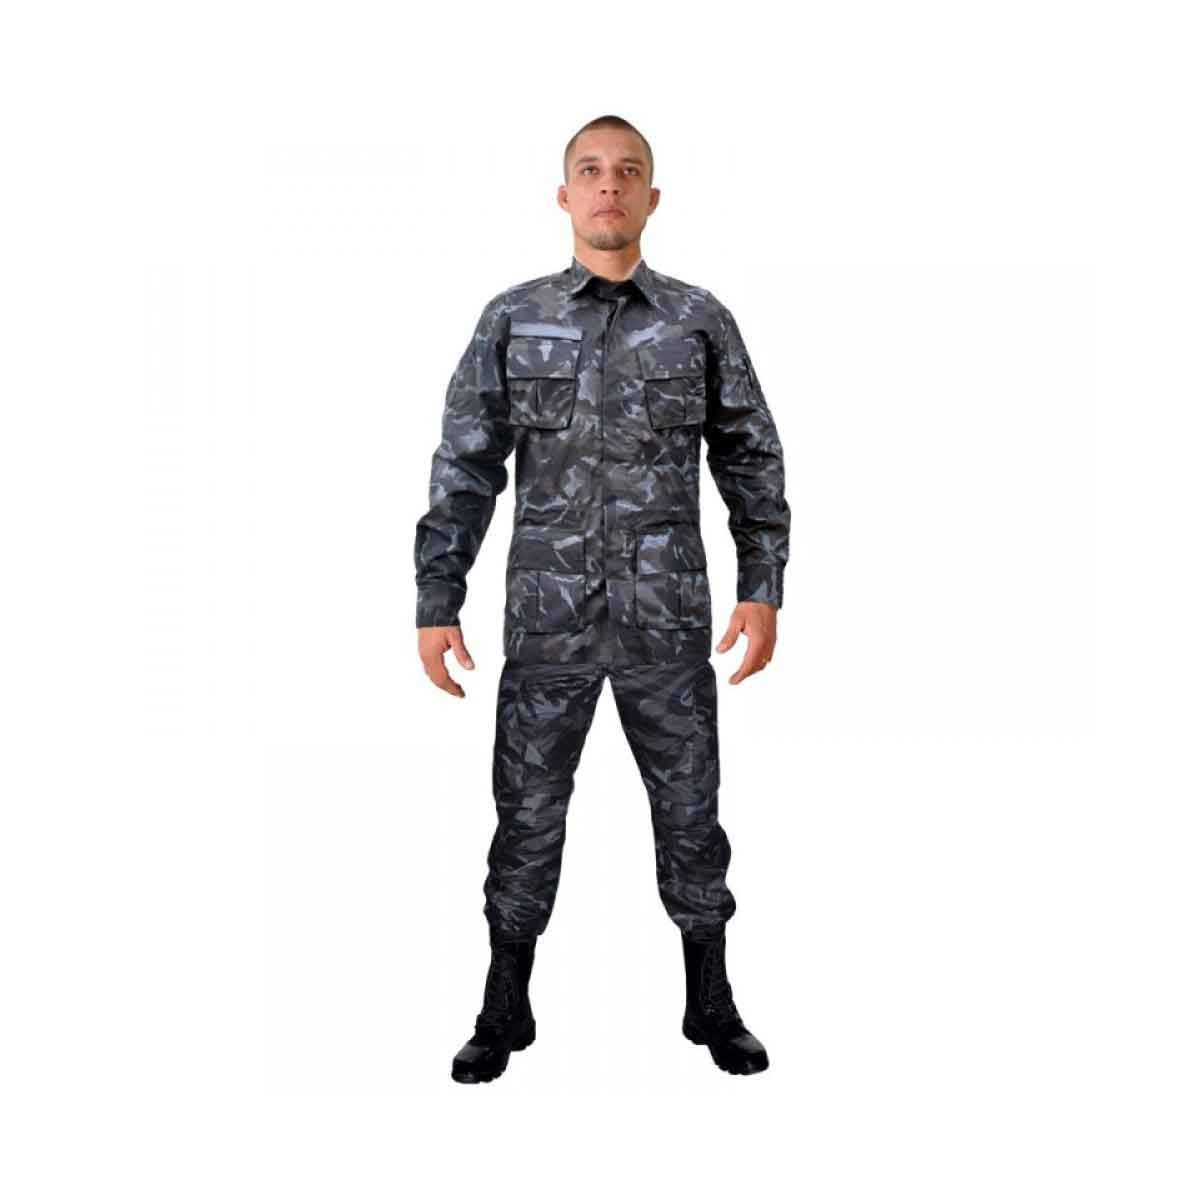 Farda Combate Ripstop Camuflada Petroleo M